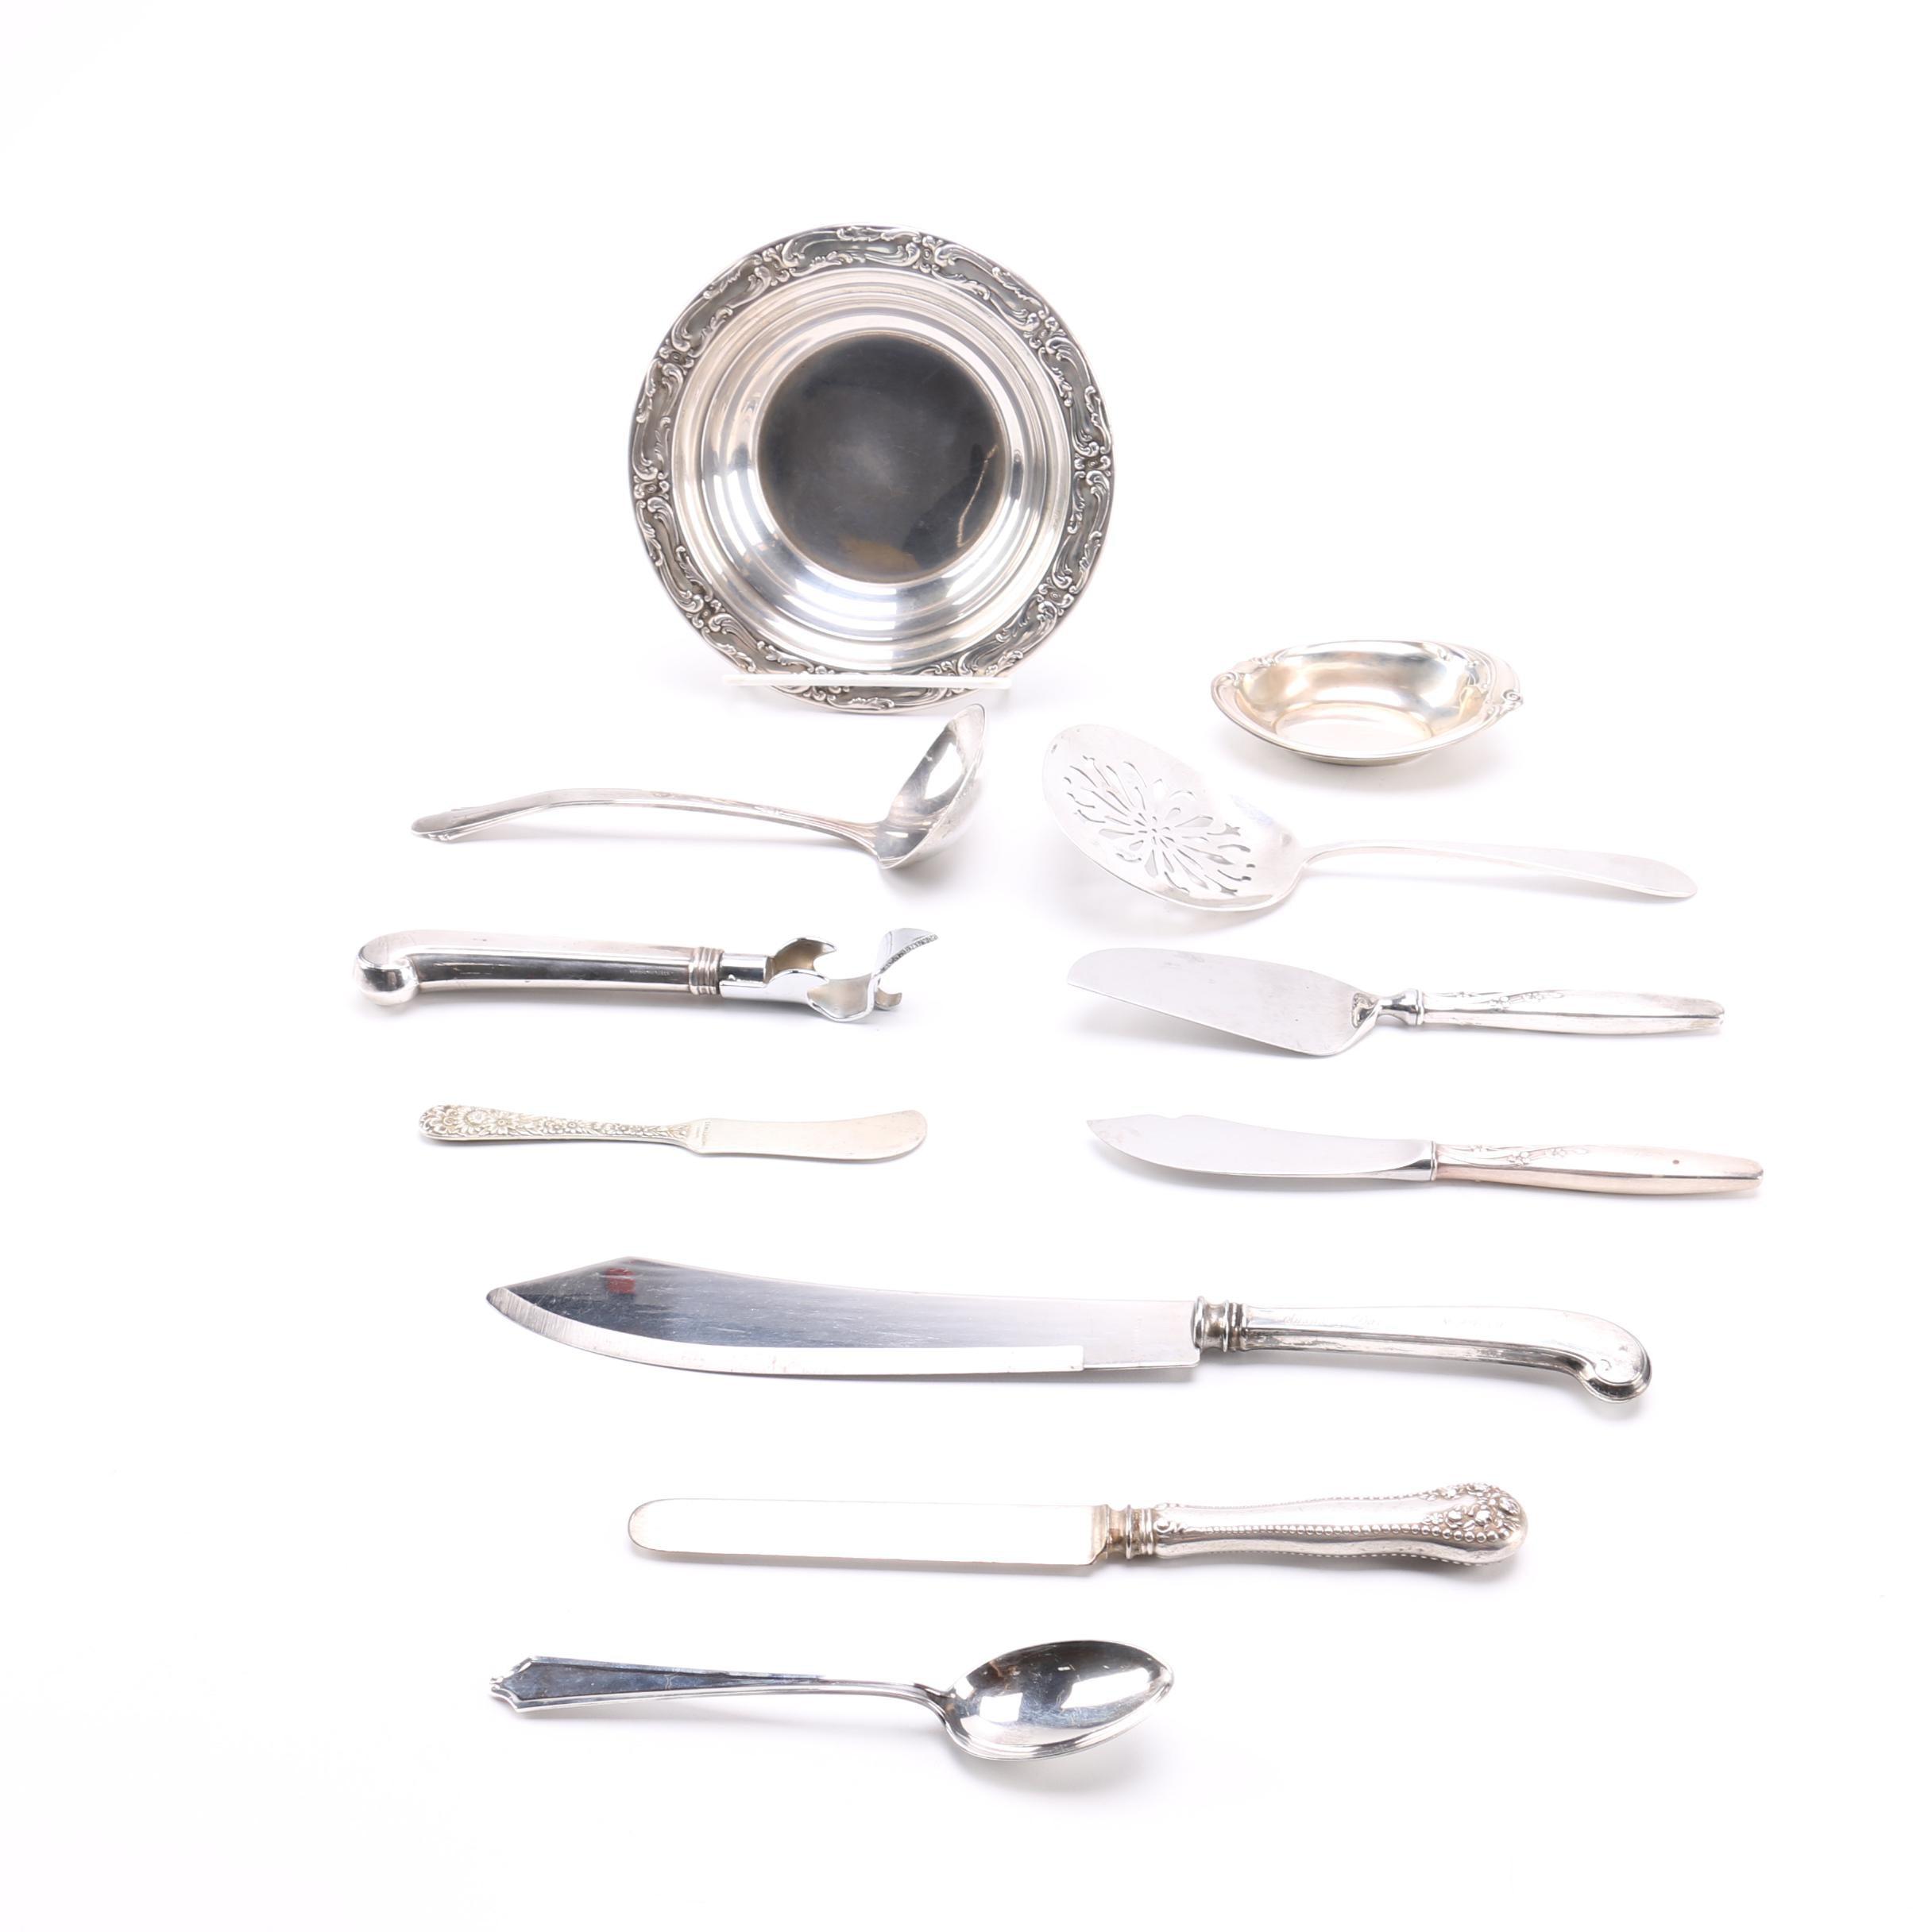 Sterling Silver Flatware Assortment Featuring Gorham